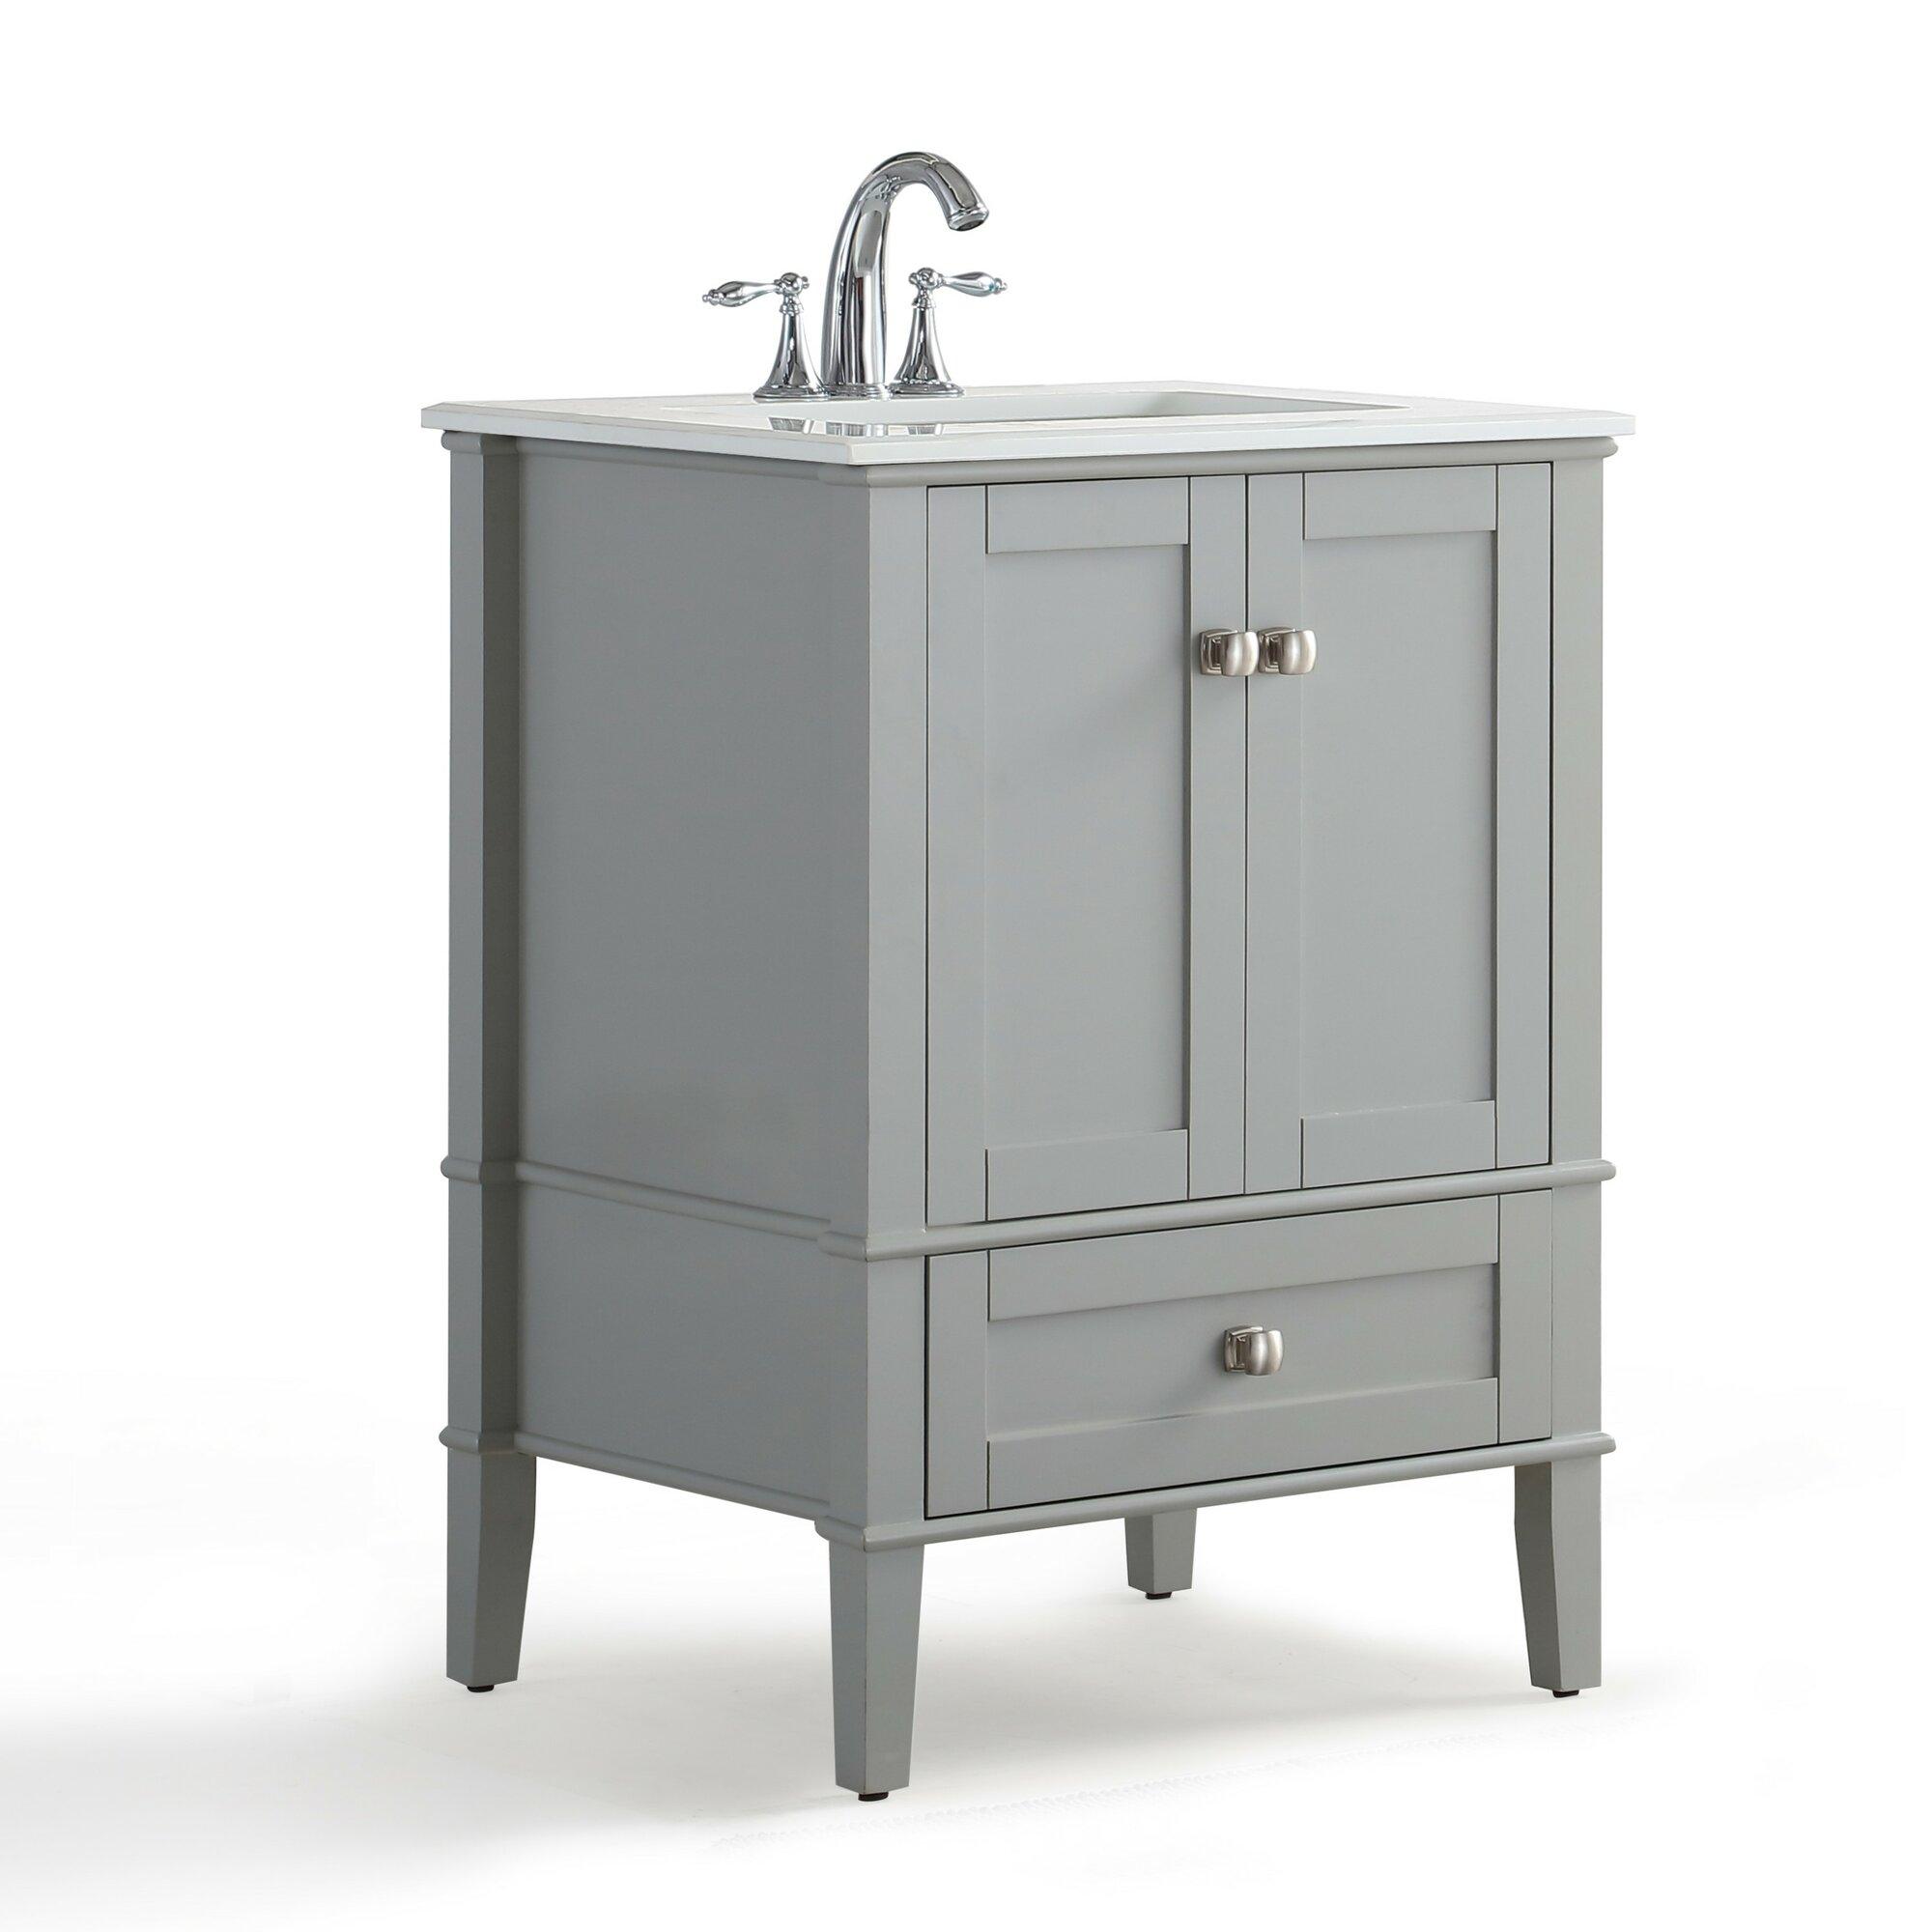 "Simpli Home Chelsea 25"" Single Bathroom Vanity with Quartz"